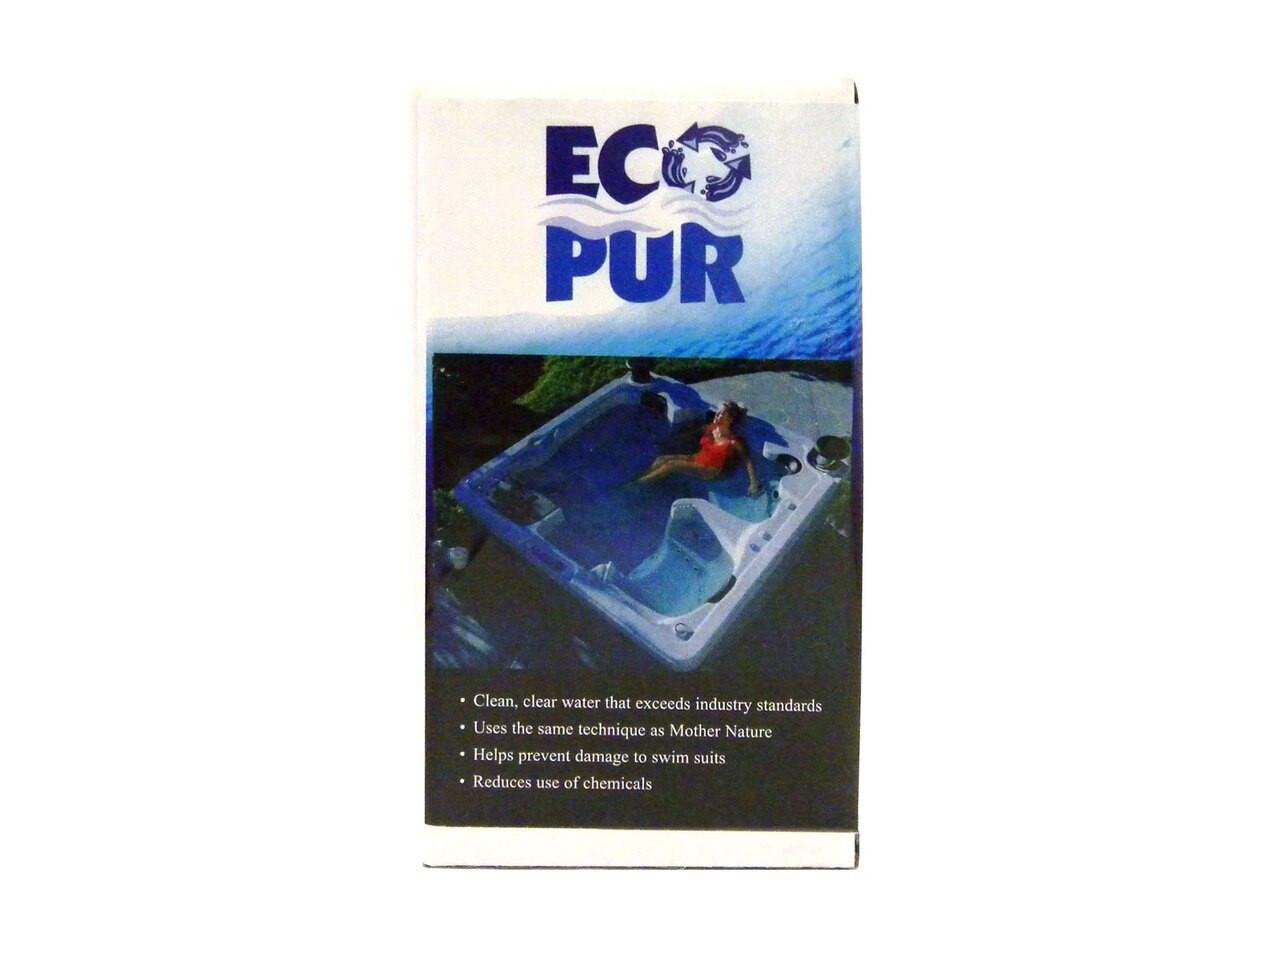 Legend Series®-Down East Spas-Legacy Whirlpool®-Microban®-Eco Pur Mineral Filter Set-X268325-PMA45-2004R-M-X268056-PMA-EP1